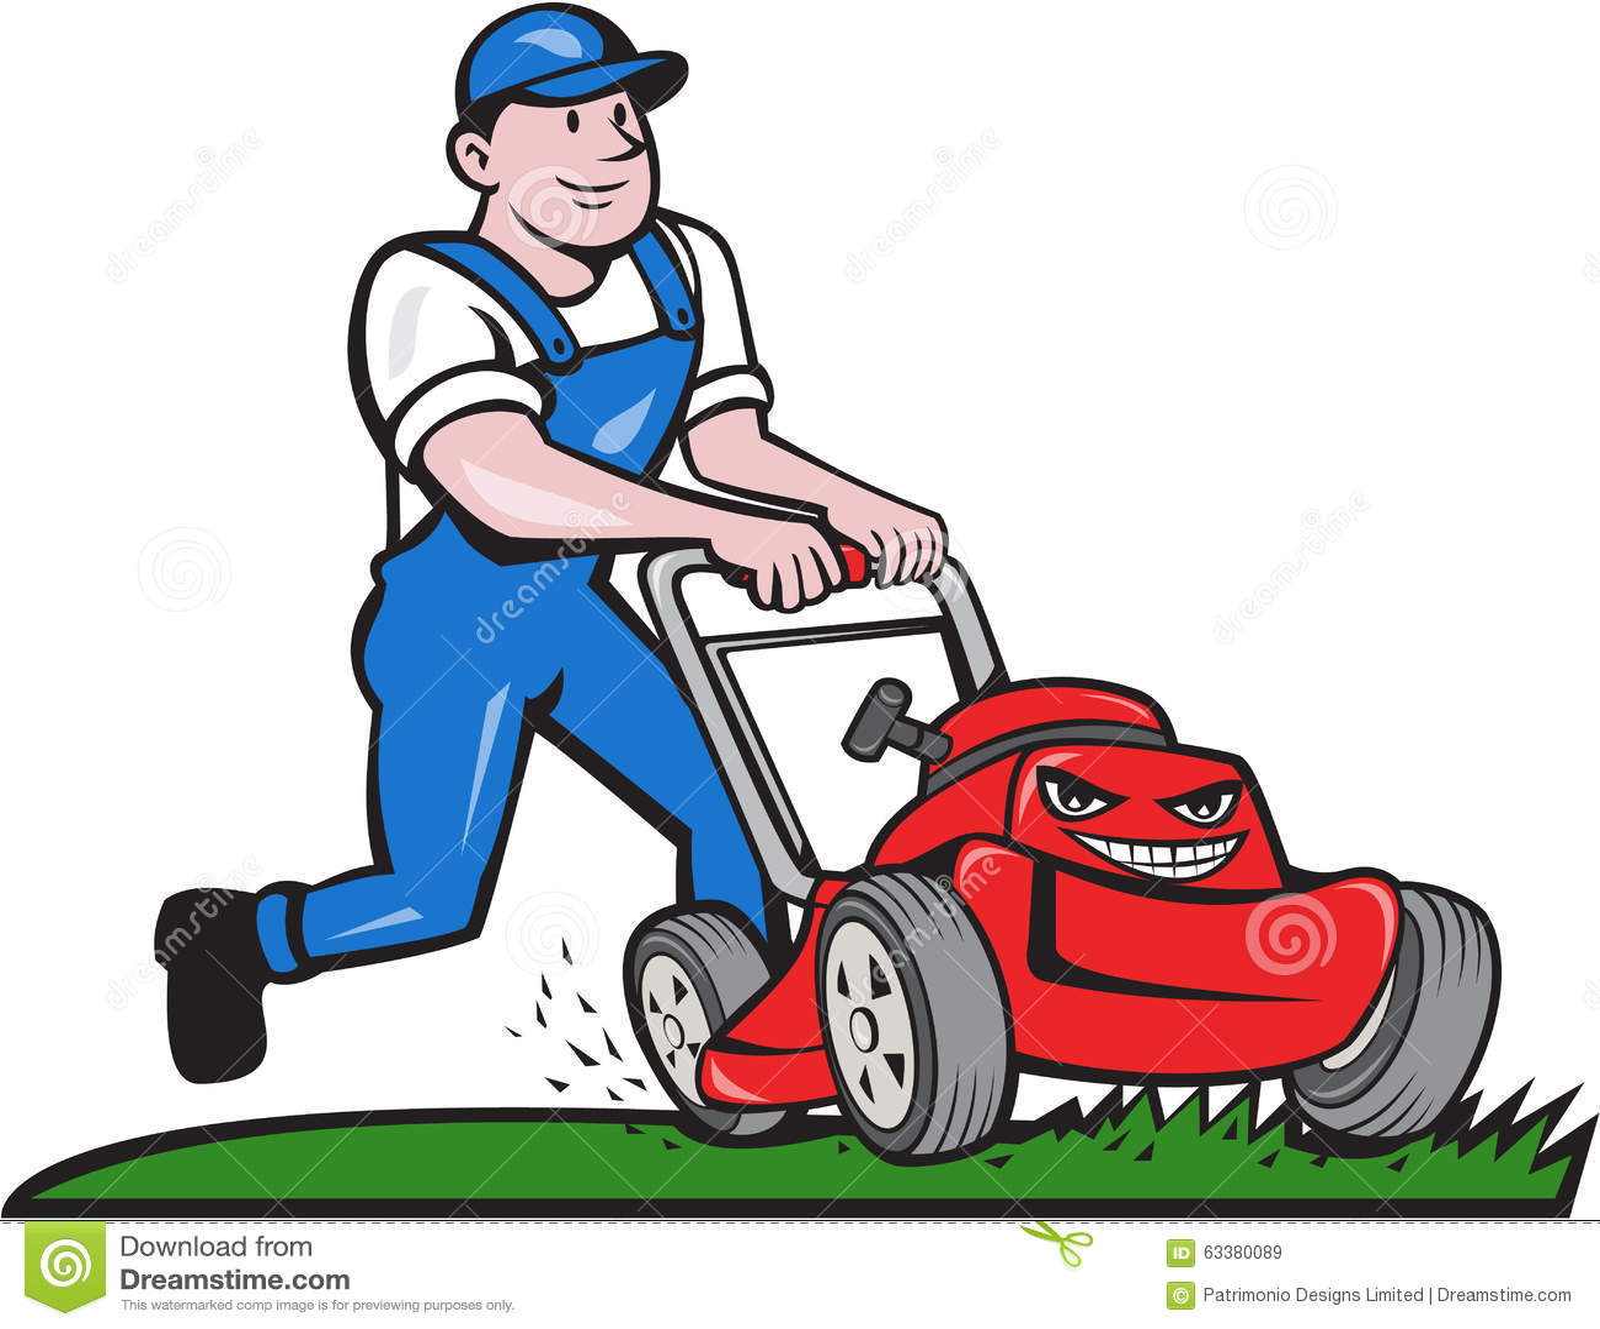 Cartoon Man On Mower : Gardener mowing lawn mower cartoon stock vector